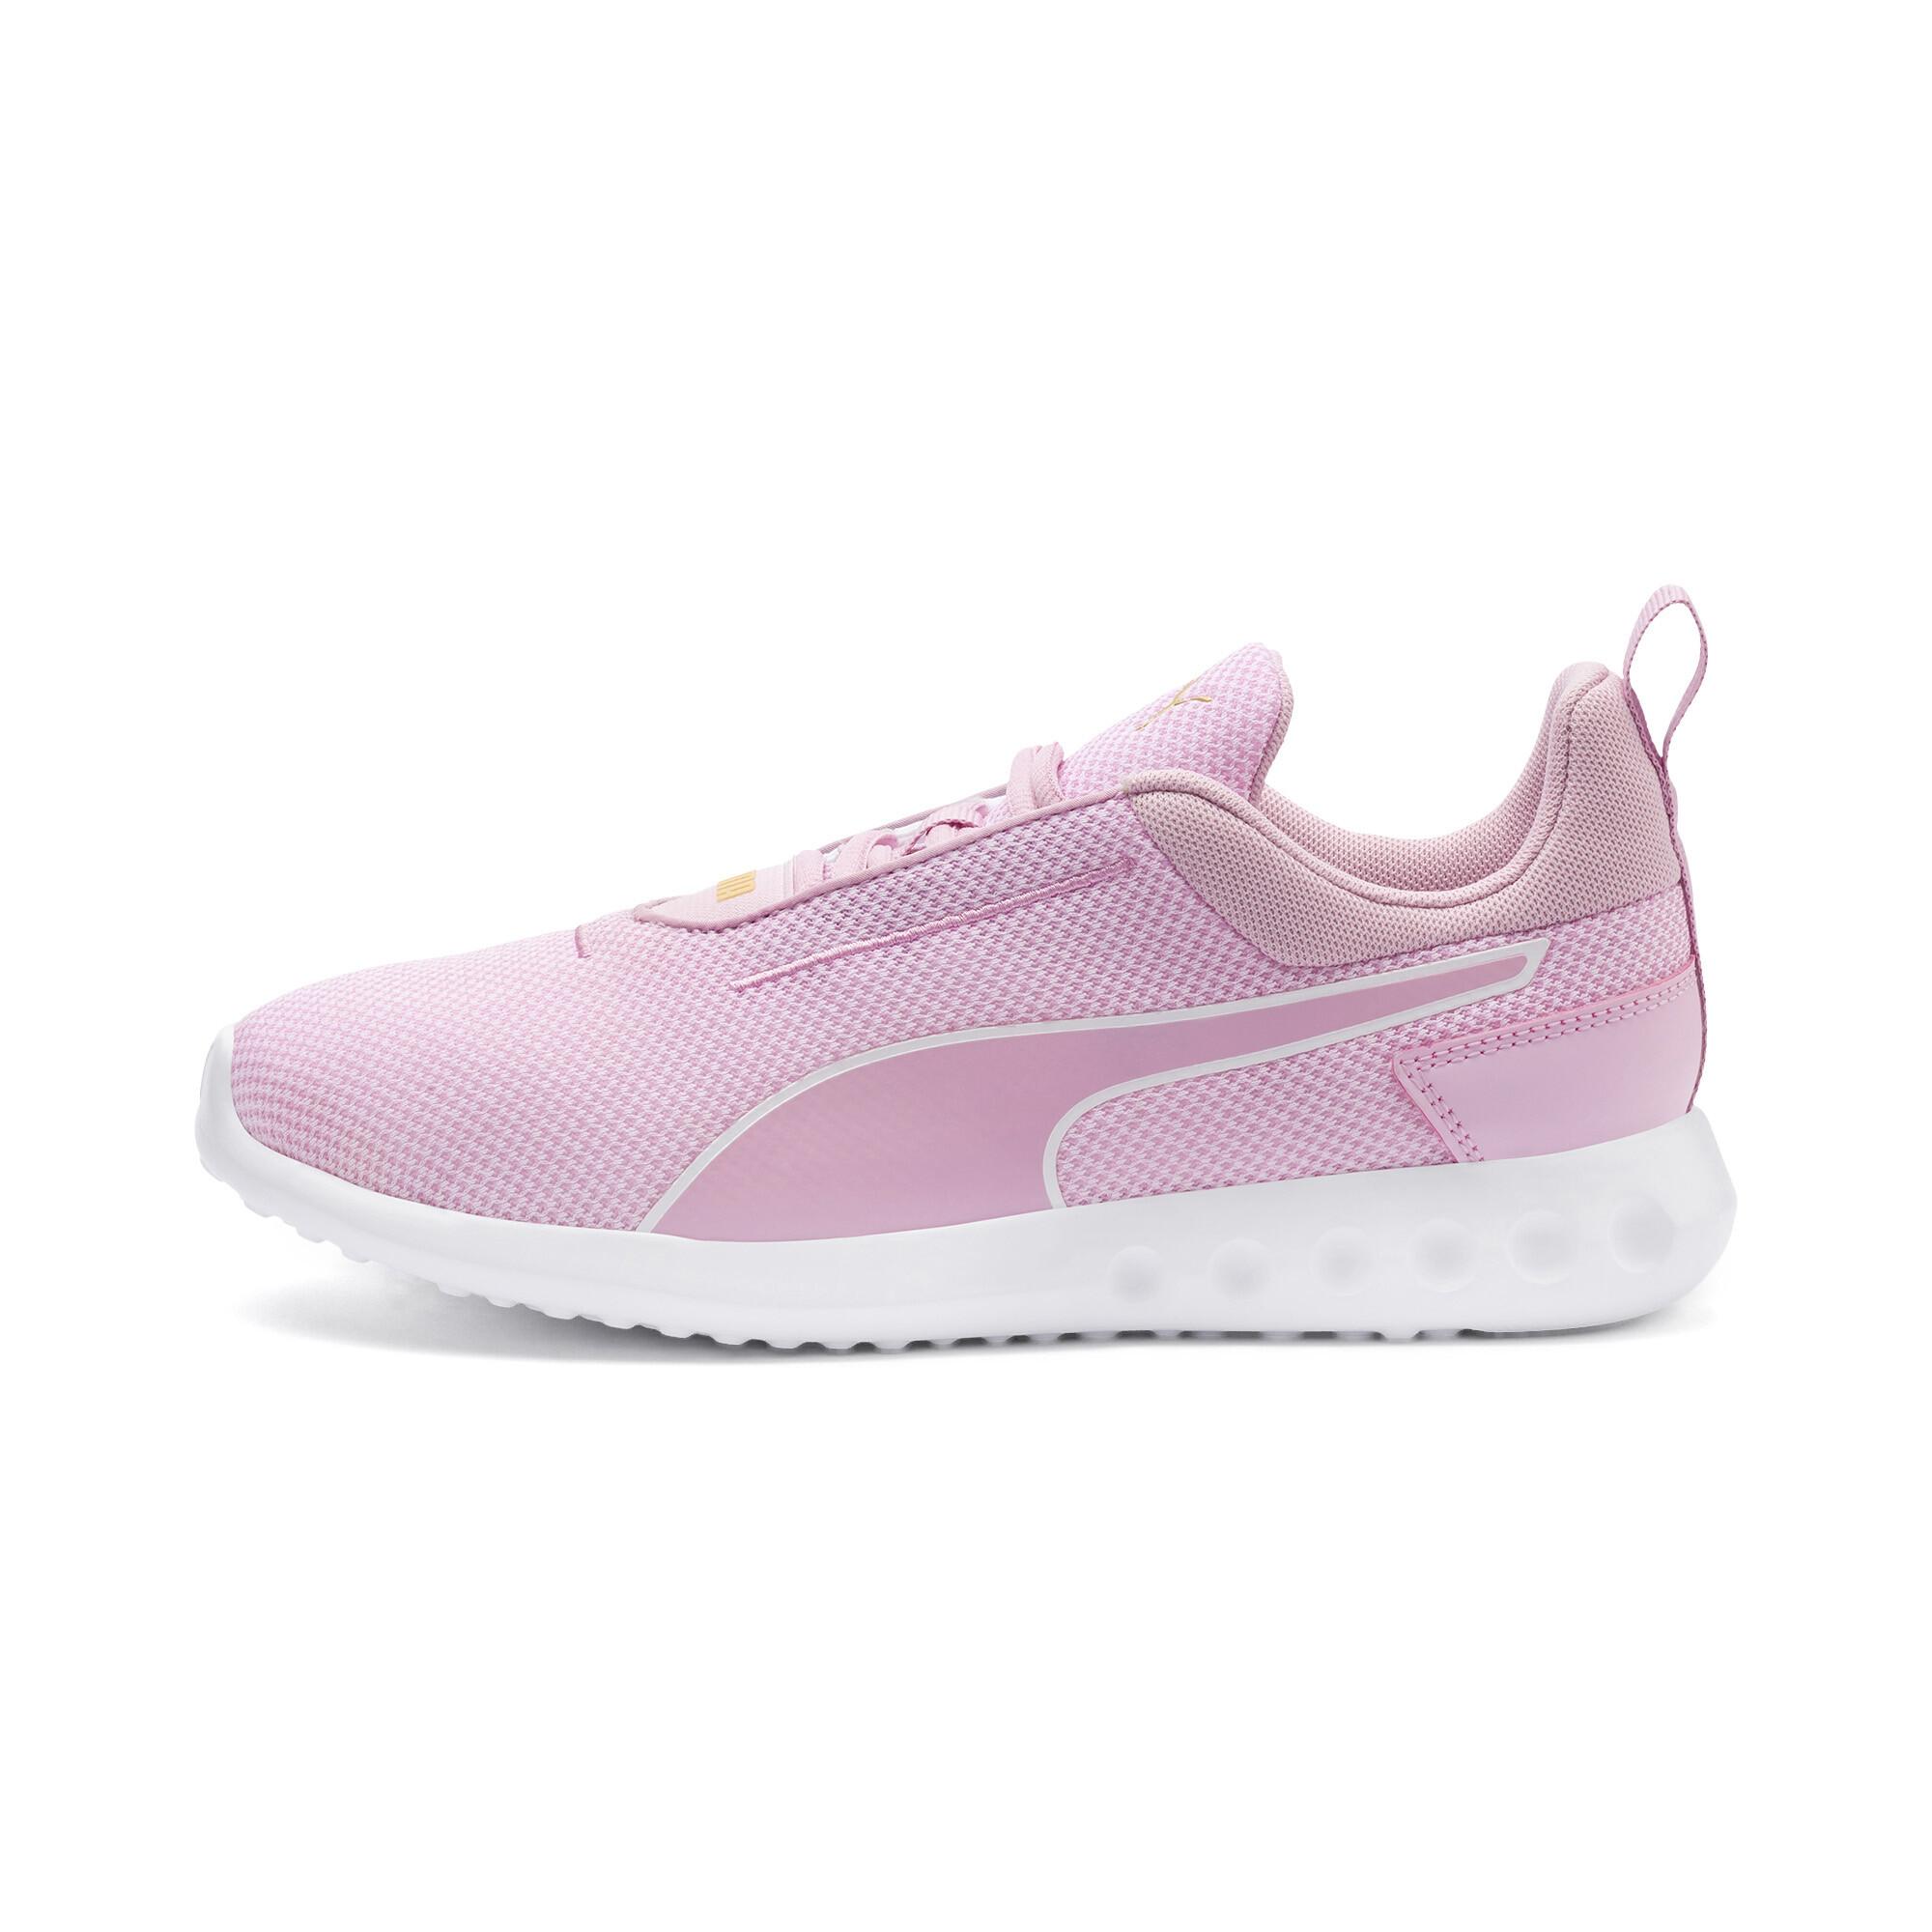 PUMA-Carson-2-Concave-Women-s-Training-Shoes-Women-Shoe-Running thumbnail 10